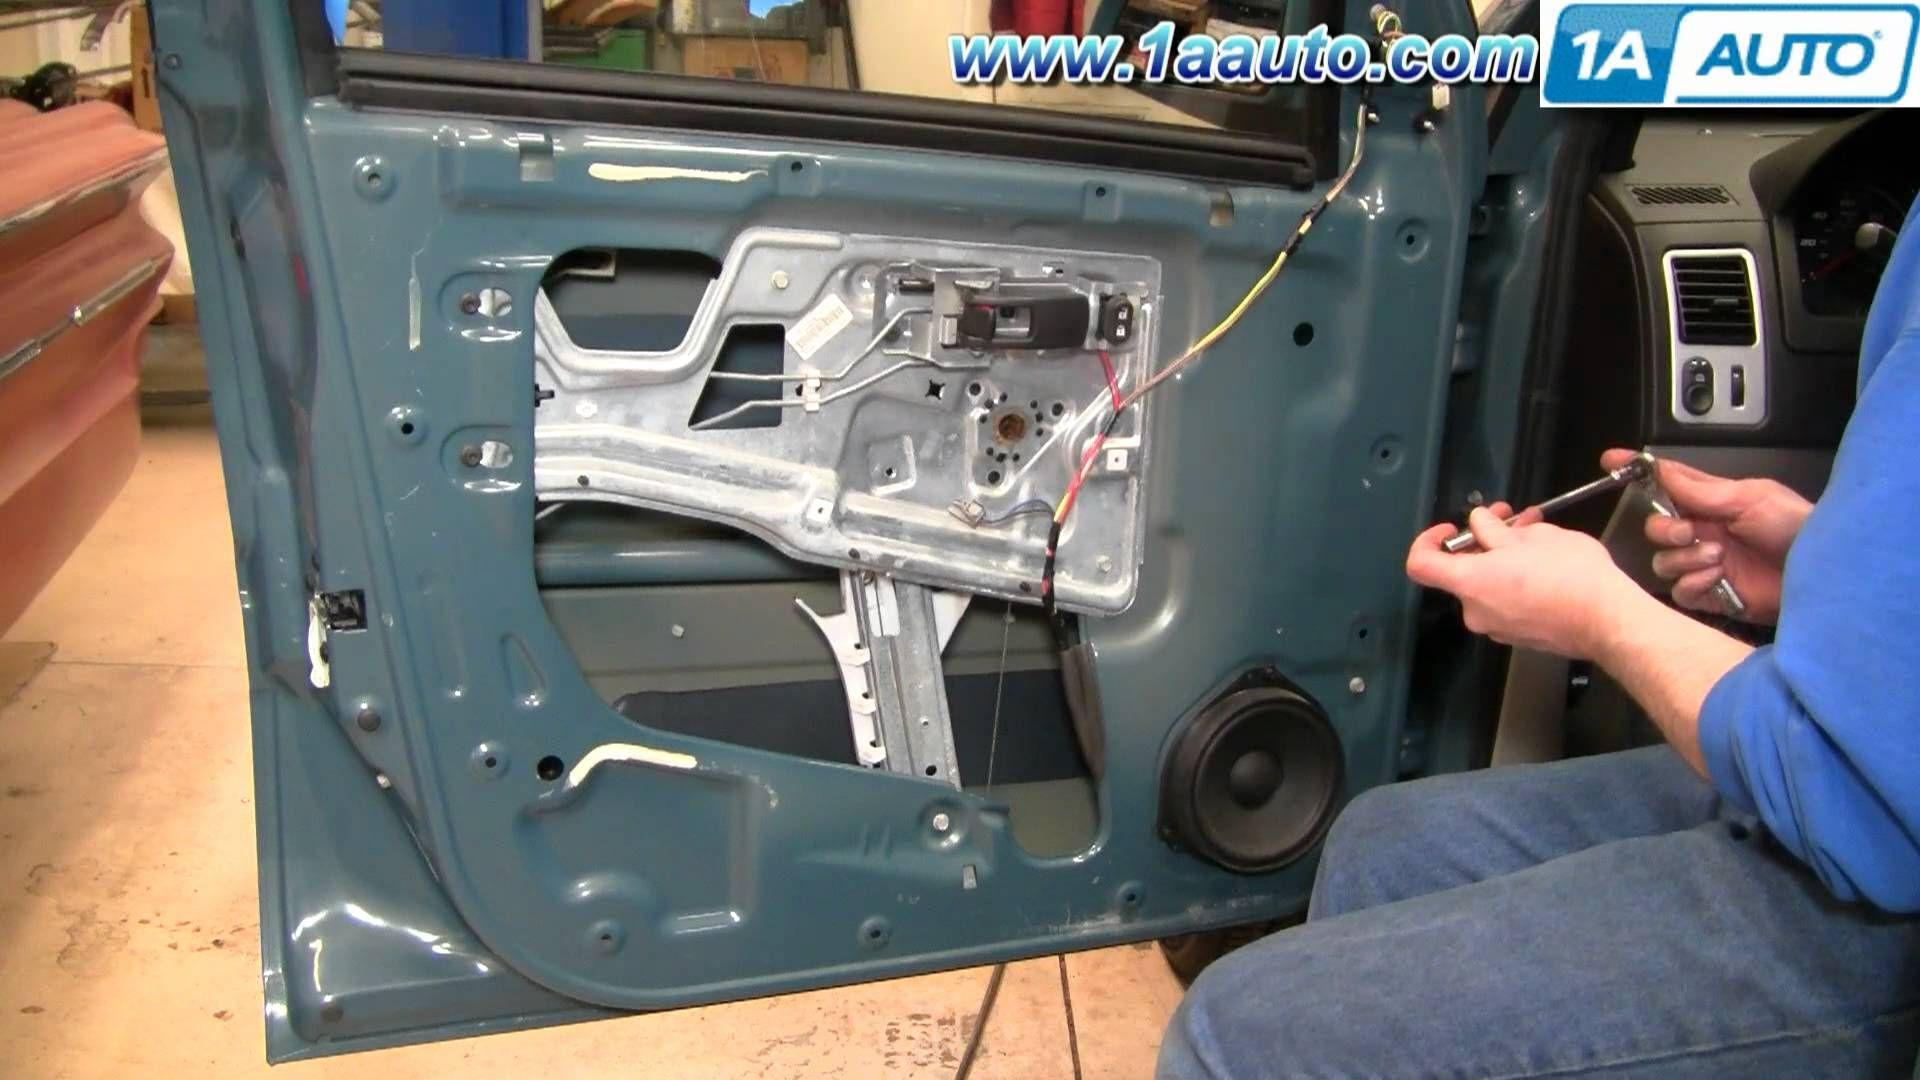 How To Install Replace Power Window Regulator Chevy Equinox 05